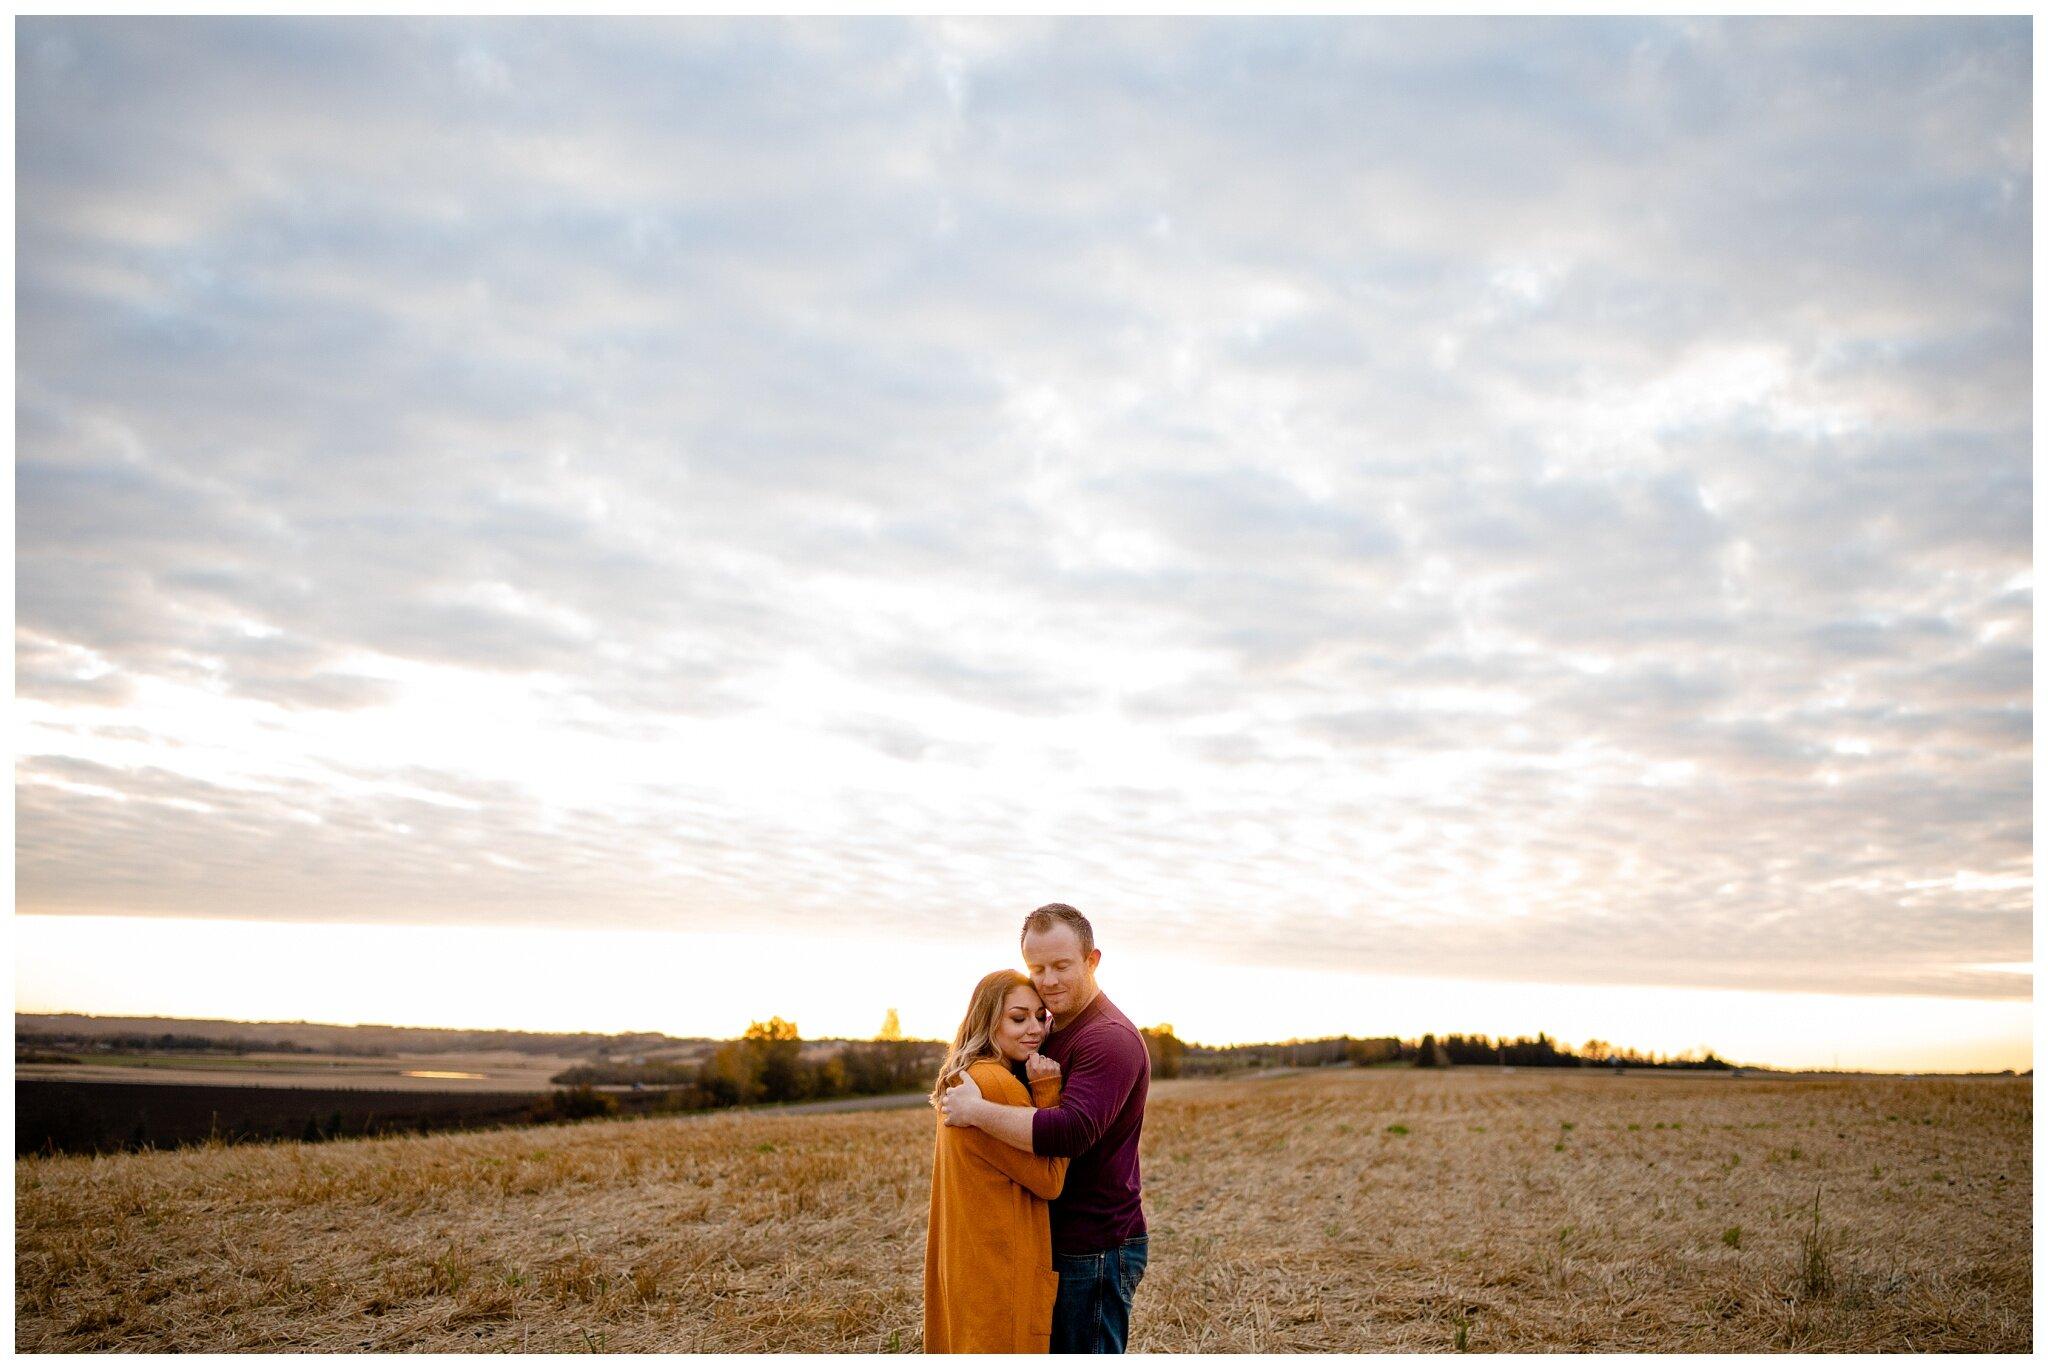 Edmonton Engagement Photographer Romantic Couples Photos Local YEG Strathcona County_0012.jpg